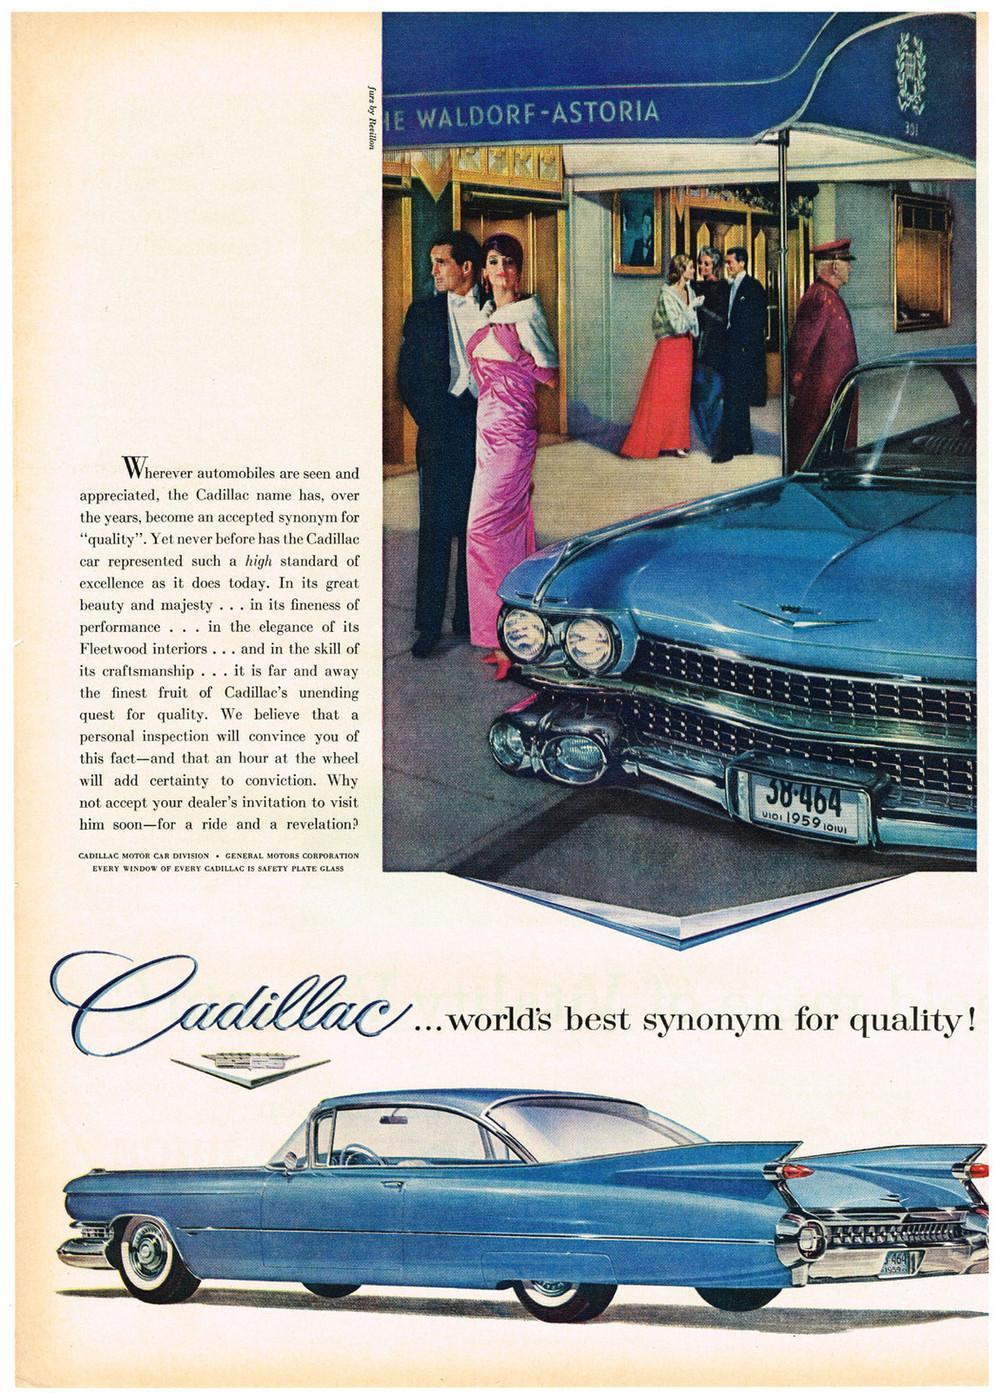 1950 59 Specs Cadillac Cruiser 1951 Sedan Deville 1958